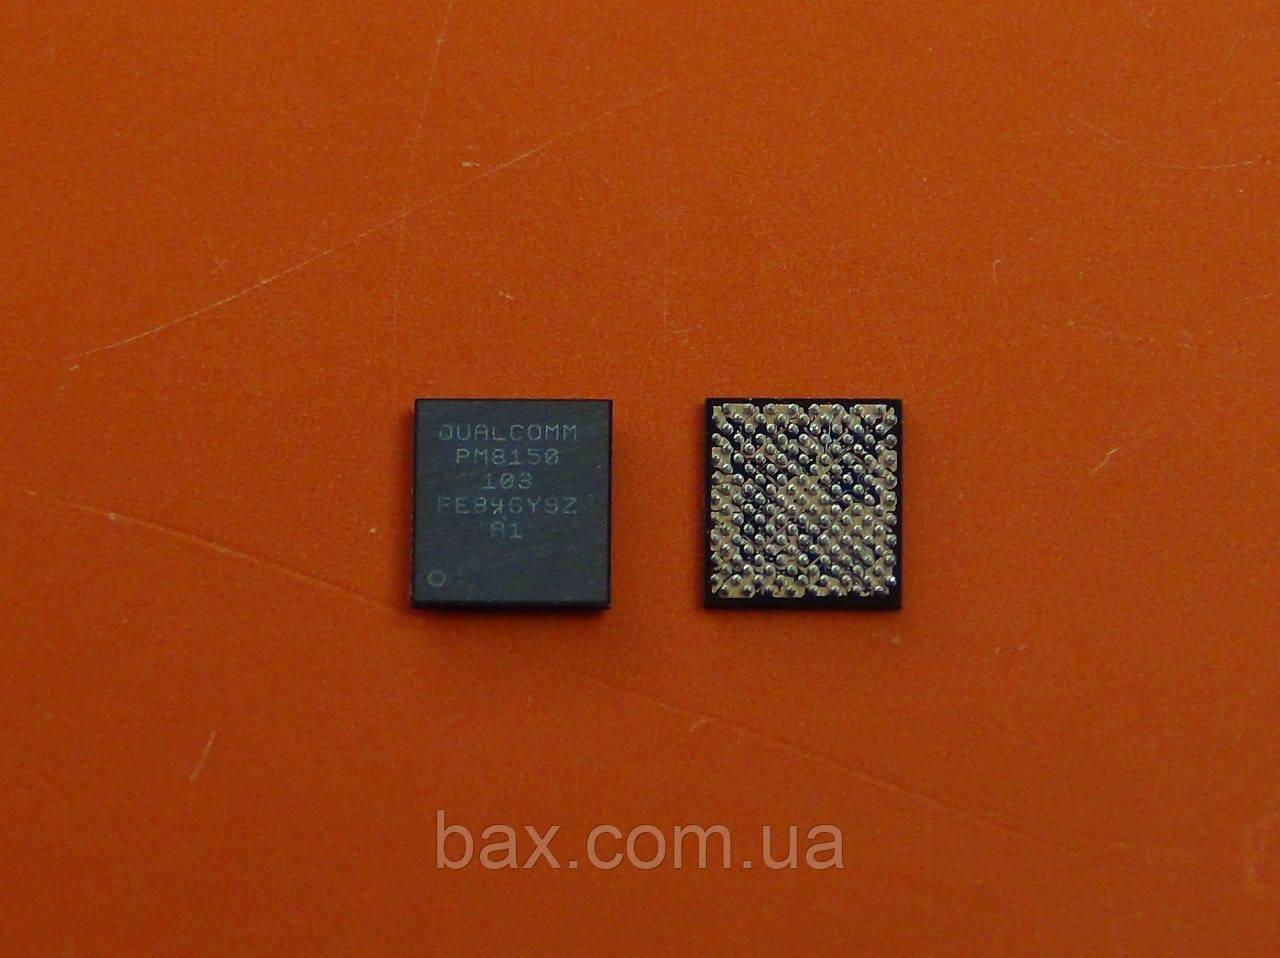 Микросхема контроллер питания PM8150 103 Оригинал Китай